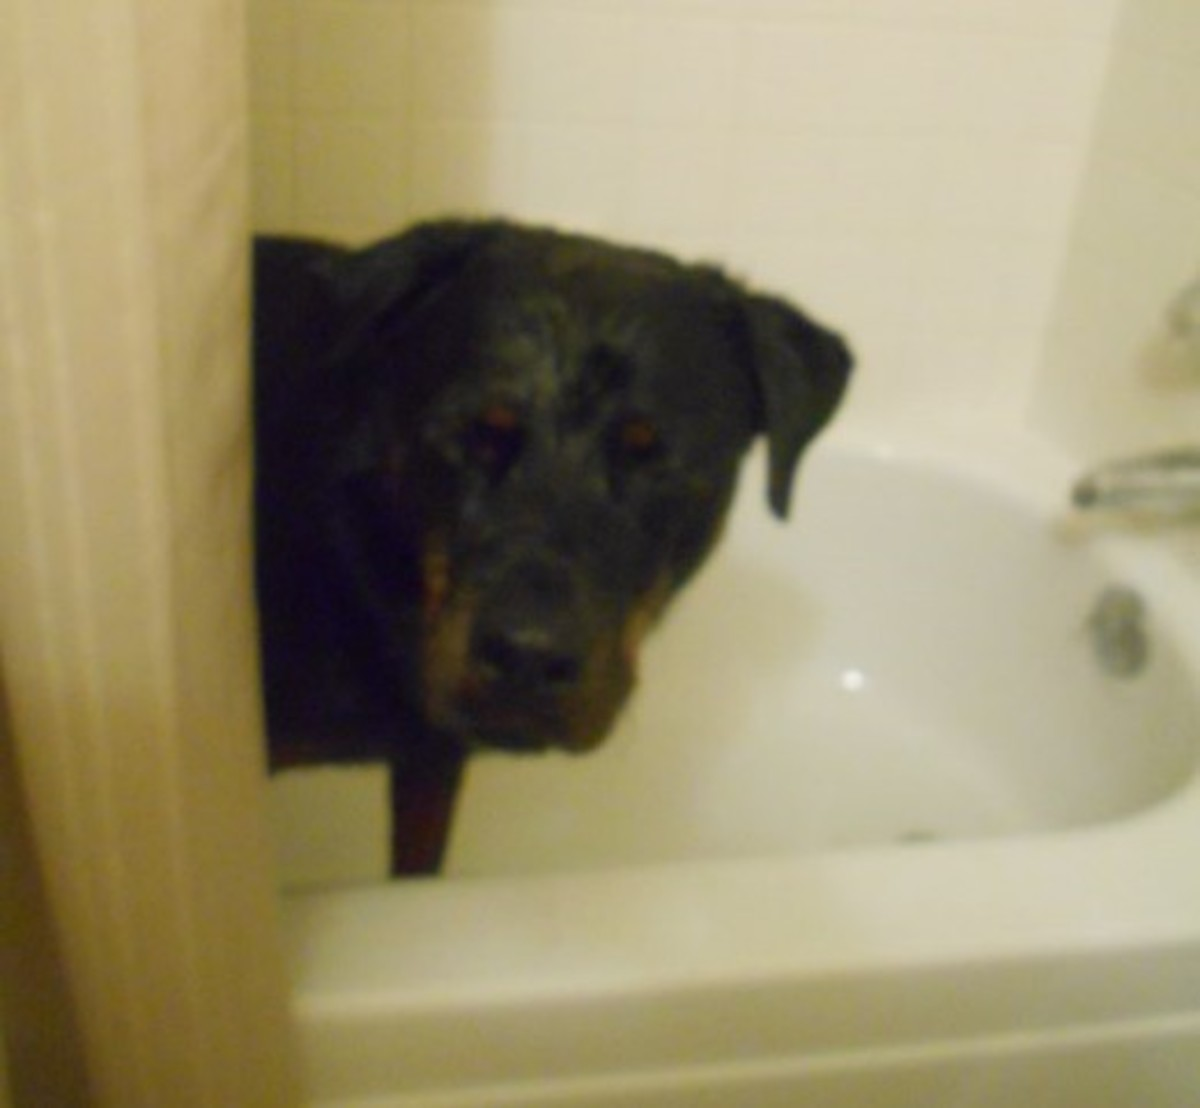 Dog skunk home remedy, dog skunk shampoo